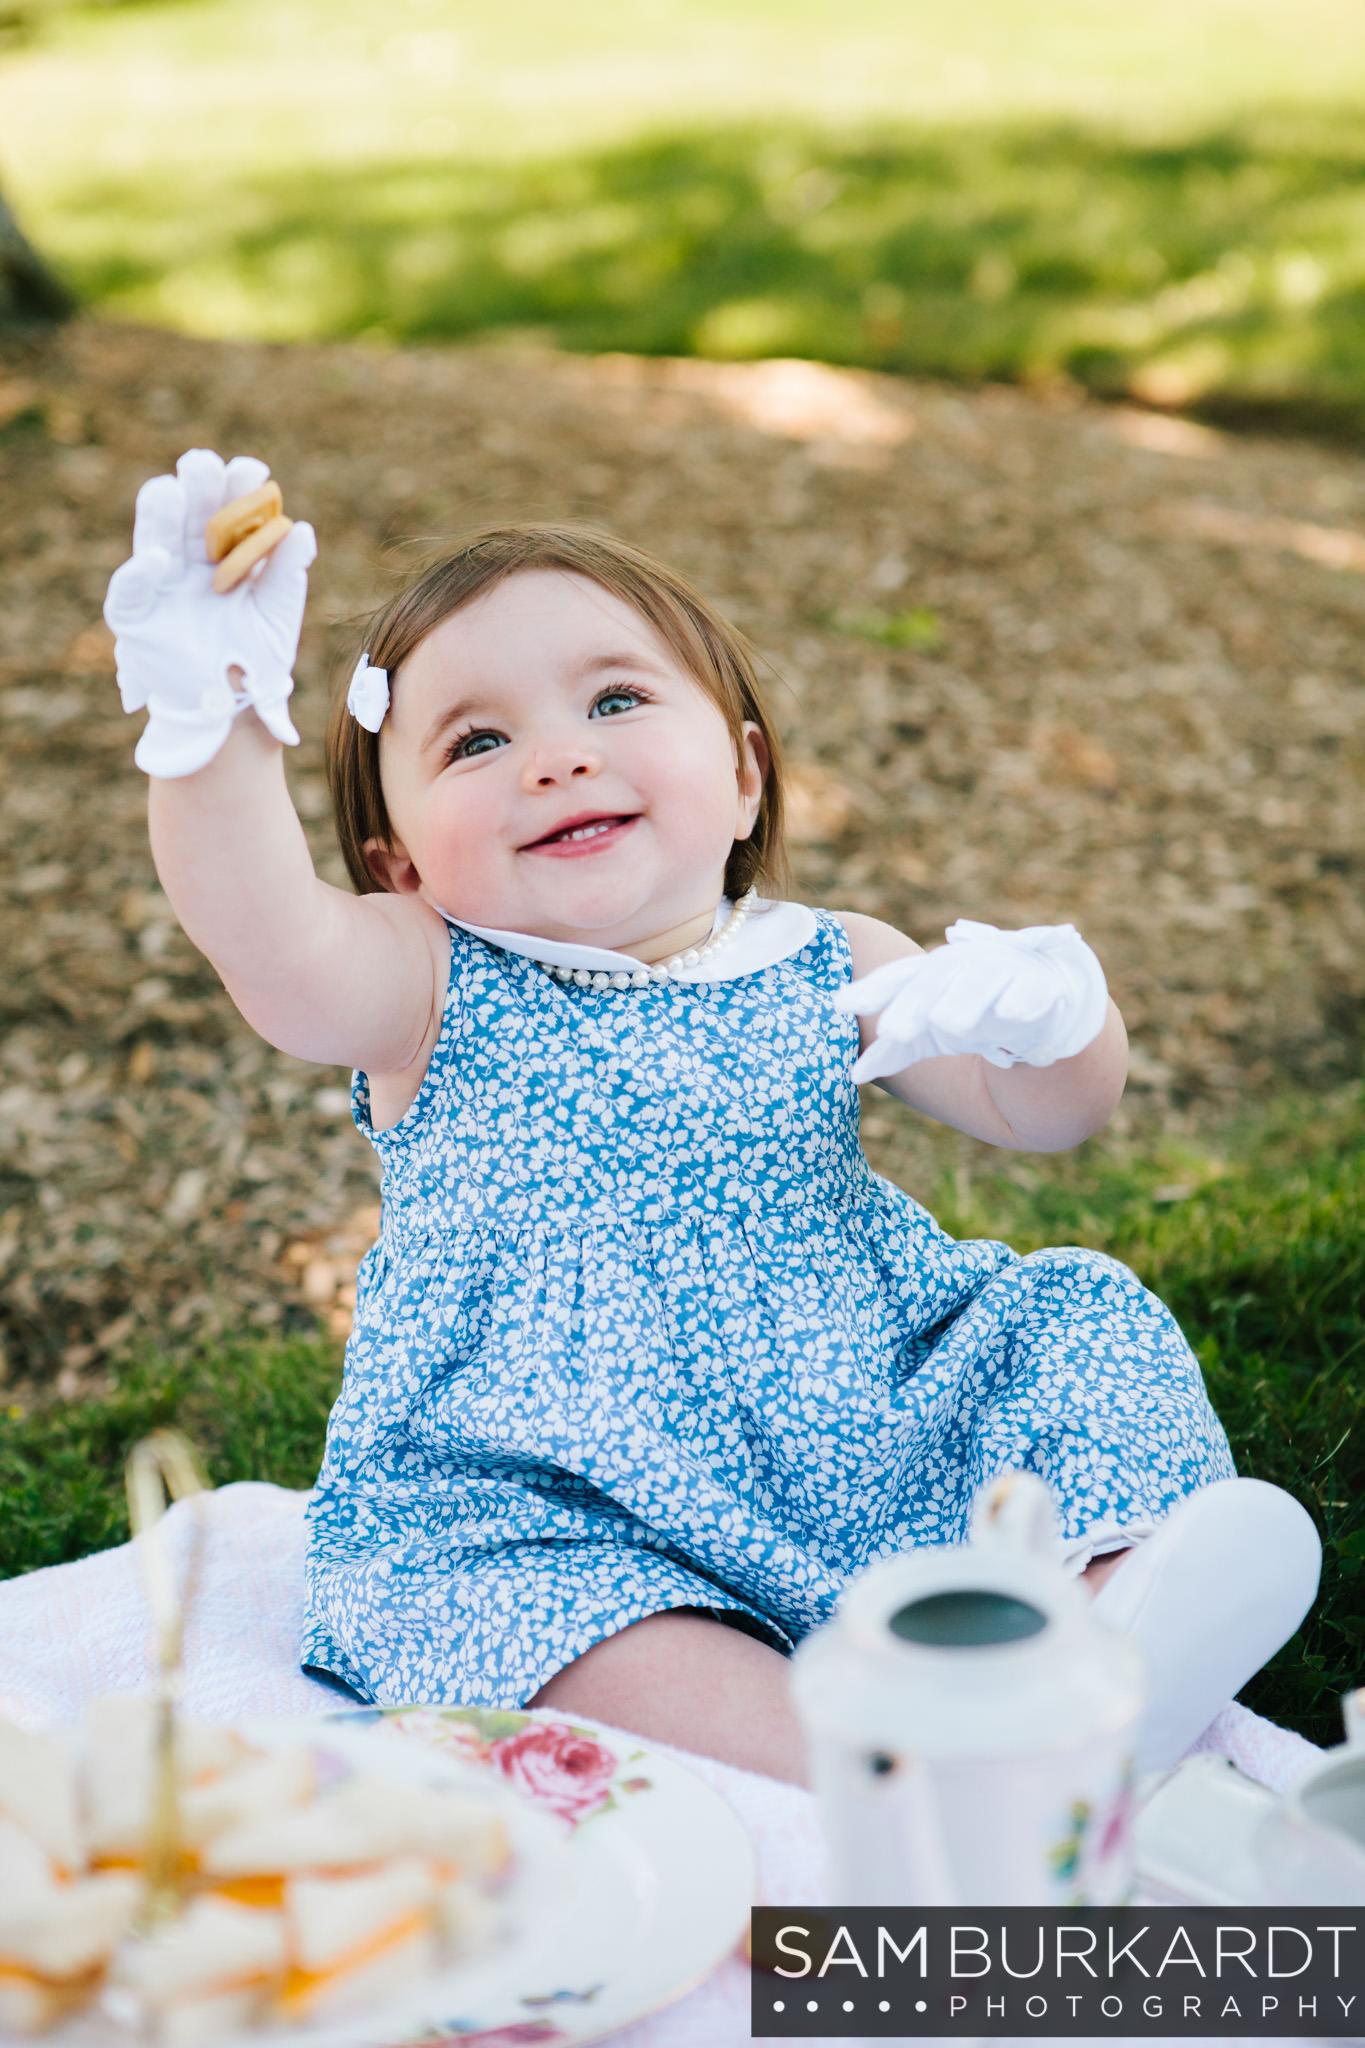 sburkardt_family_portraits_photoshoot_ridgefield_connecticut_summer_tea_party_012.jpg